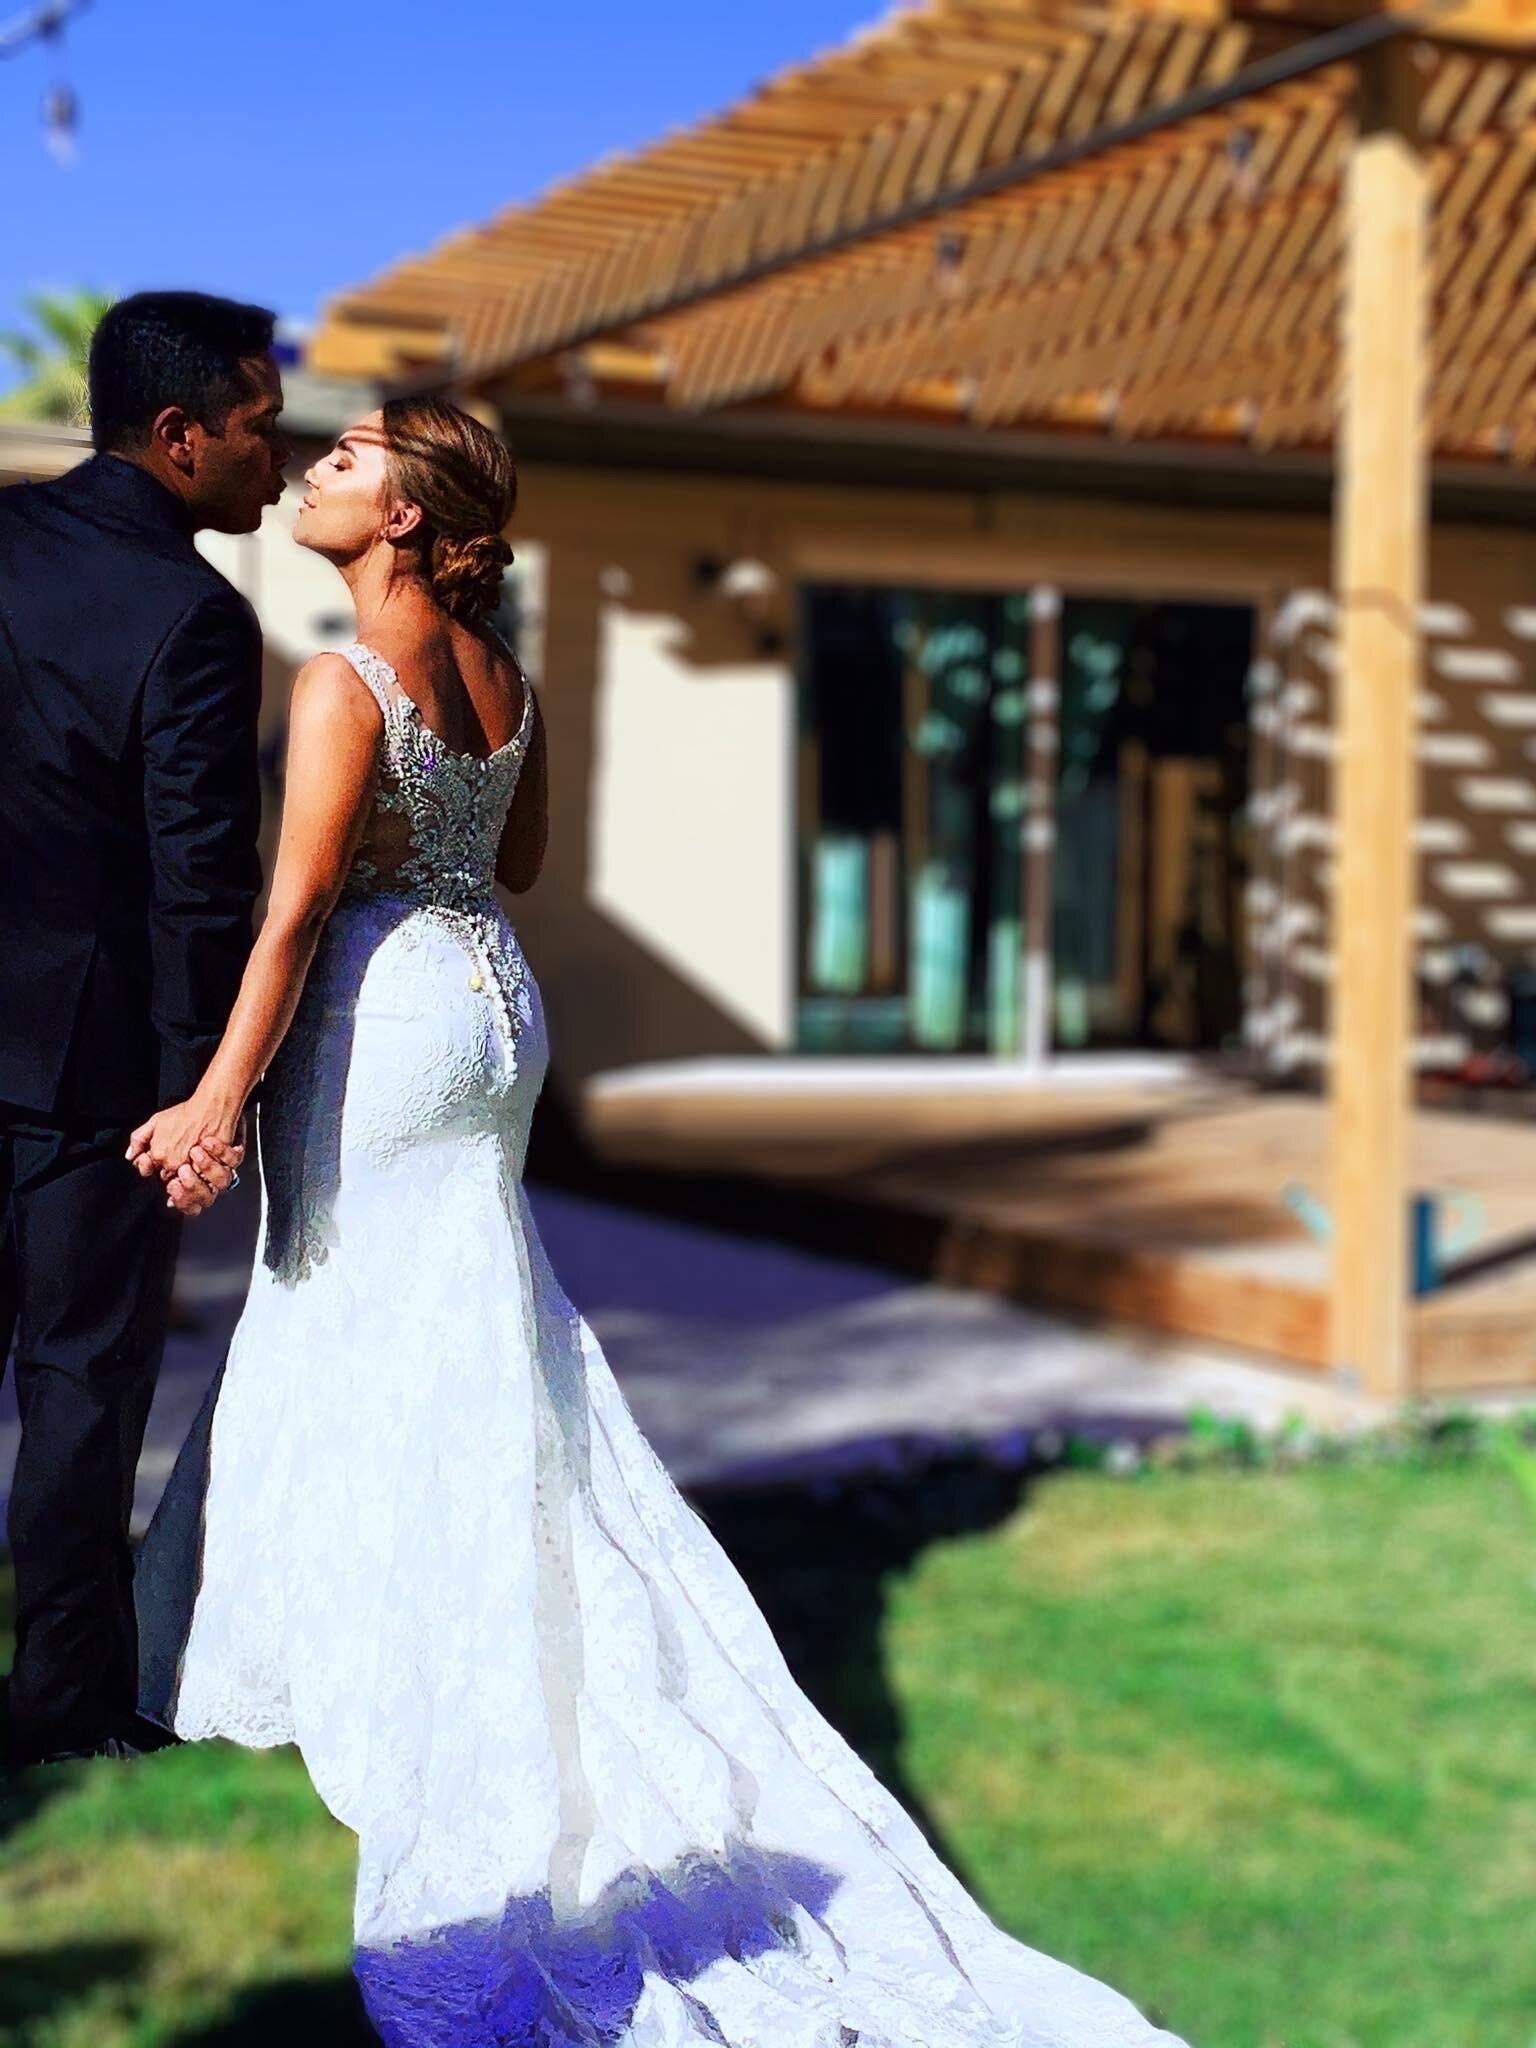 Finding AZ Wedding Ceremony